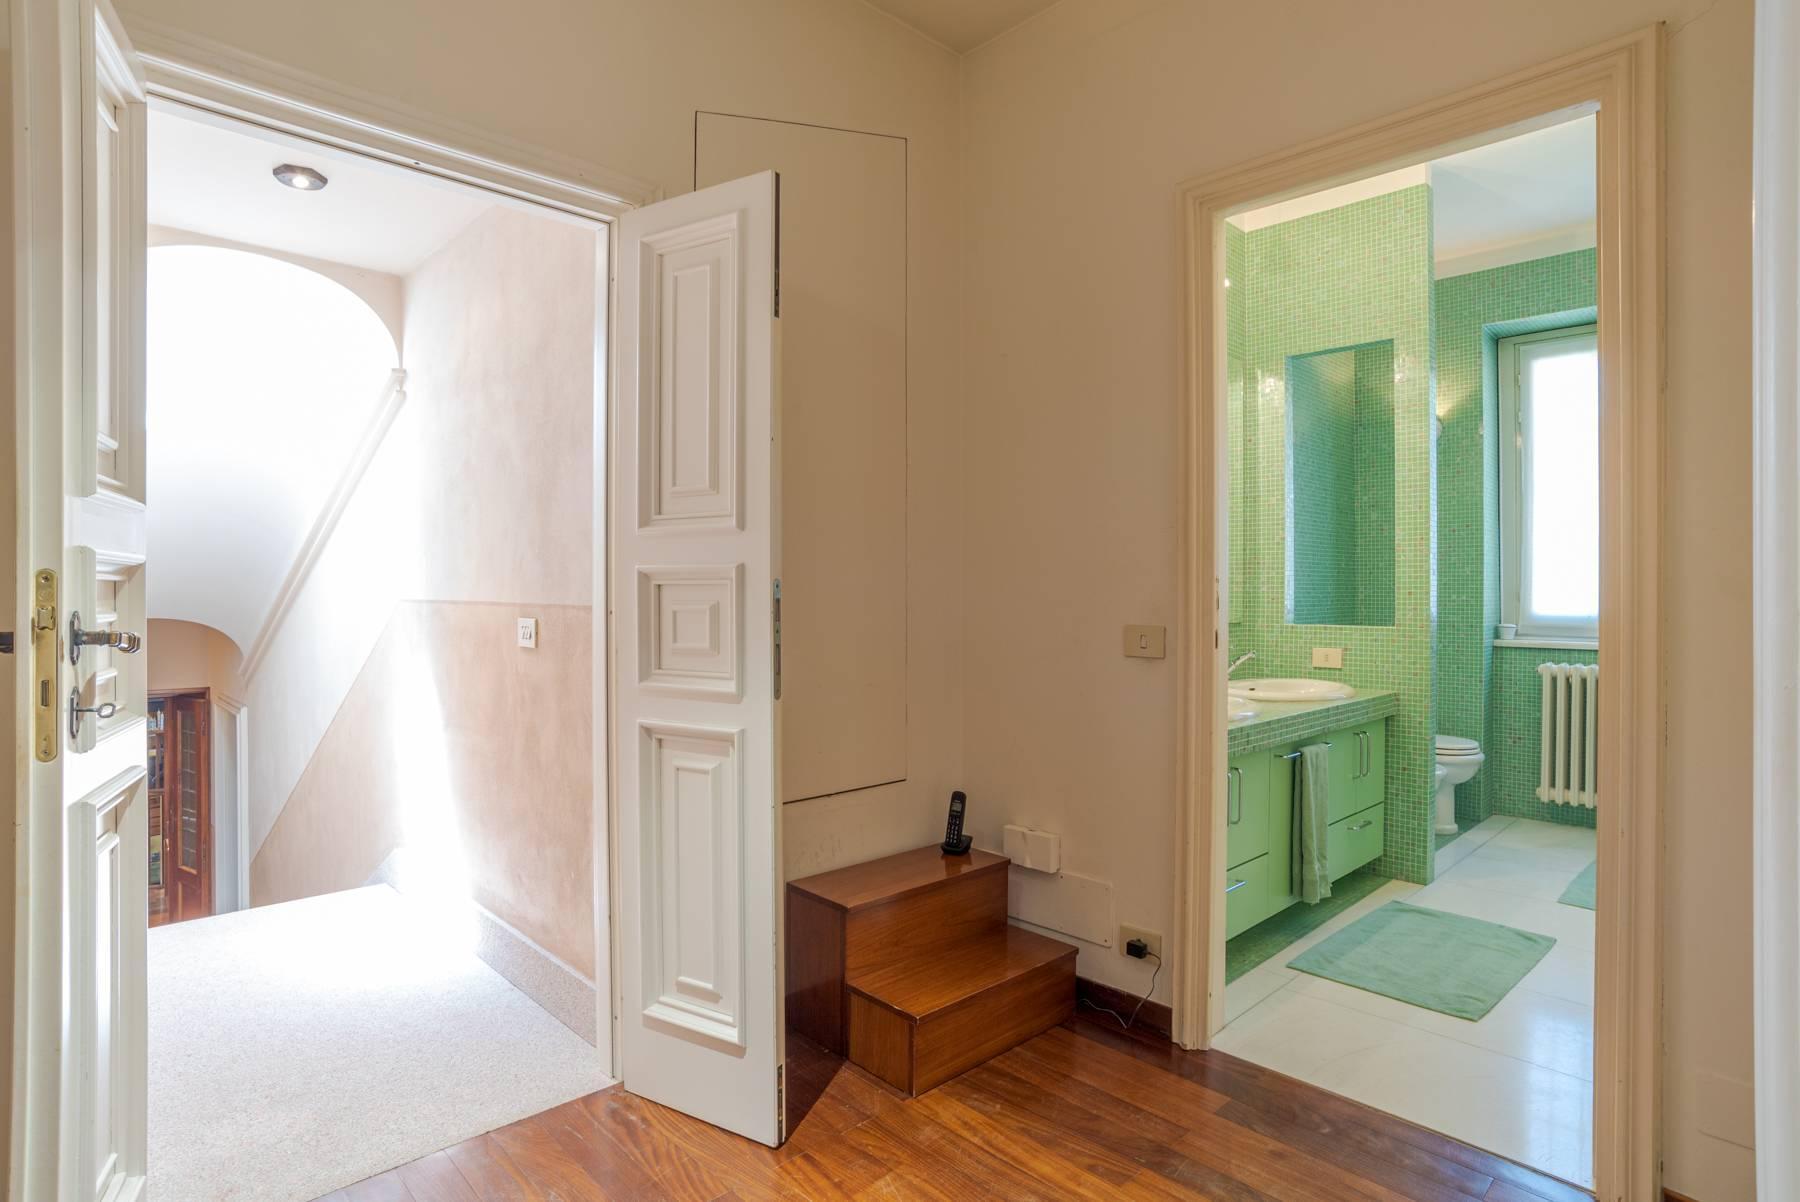 Magnifica proprietà immersa nel verde a Pavia - 15